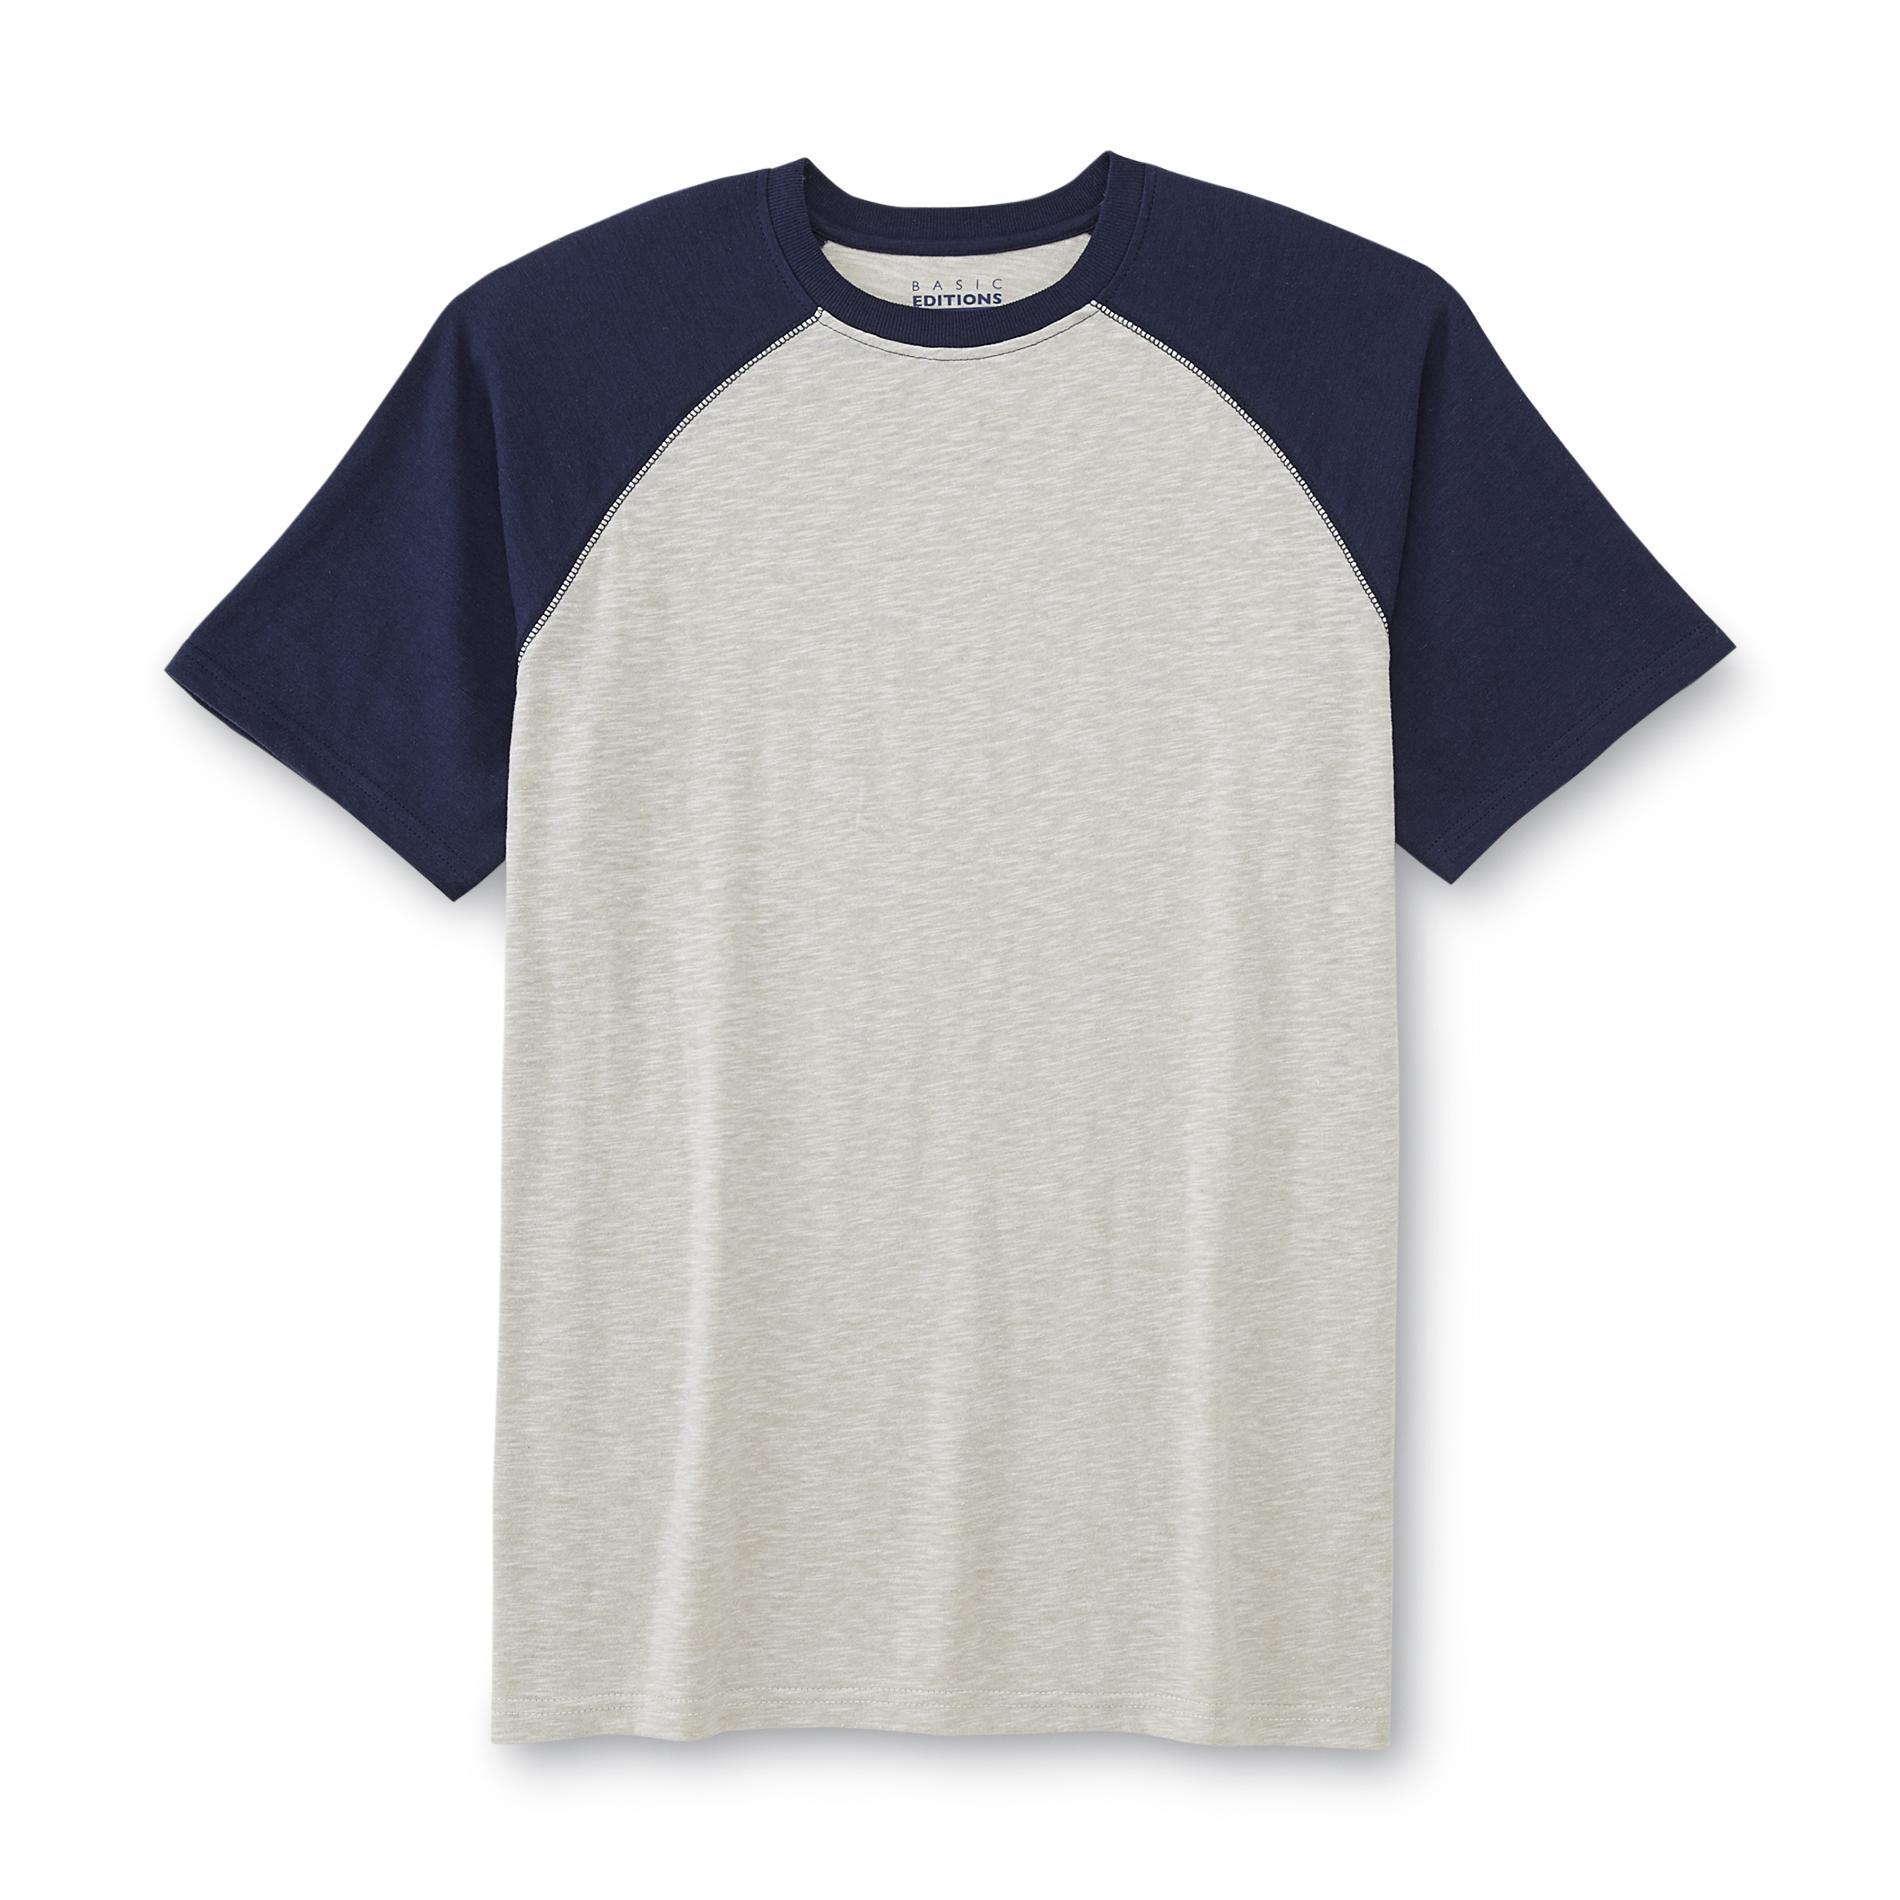 Basic Editions Men's Big & Tall Raglan T-Shirt